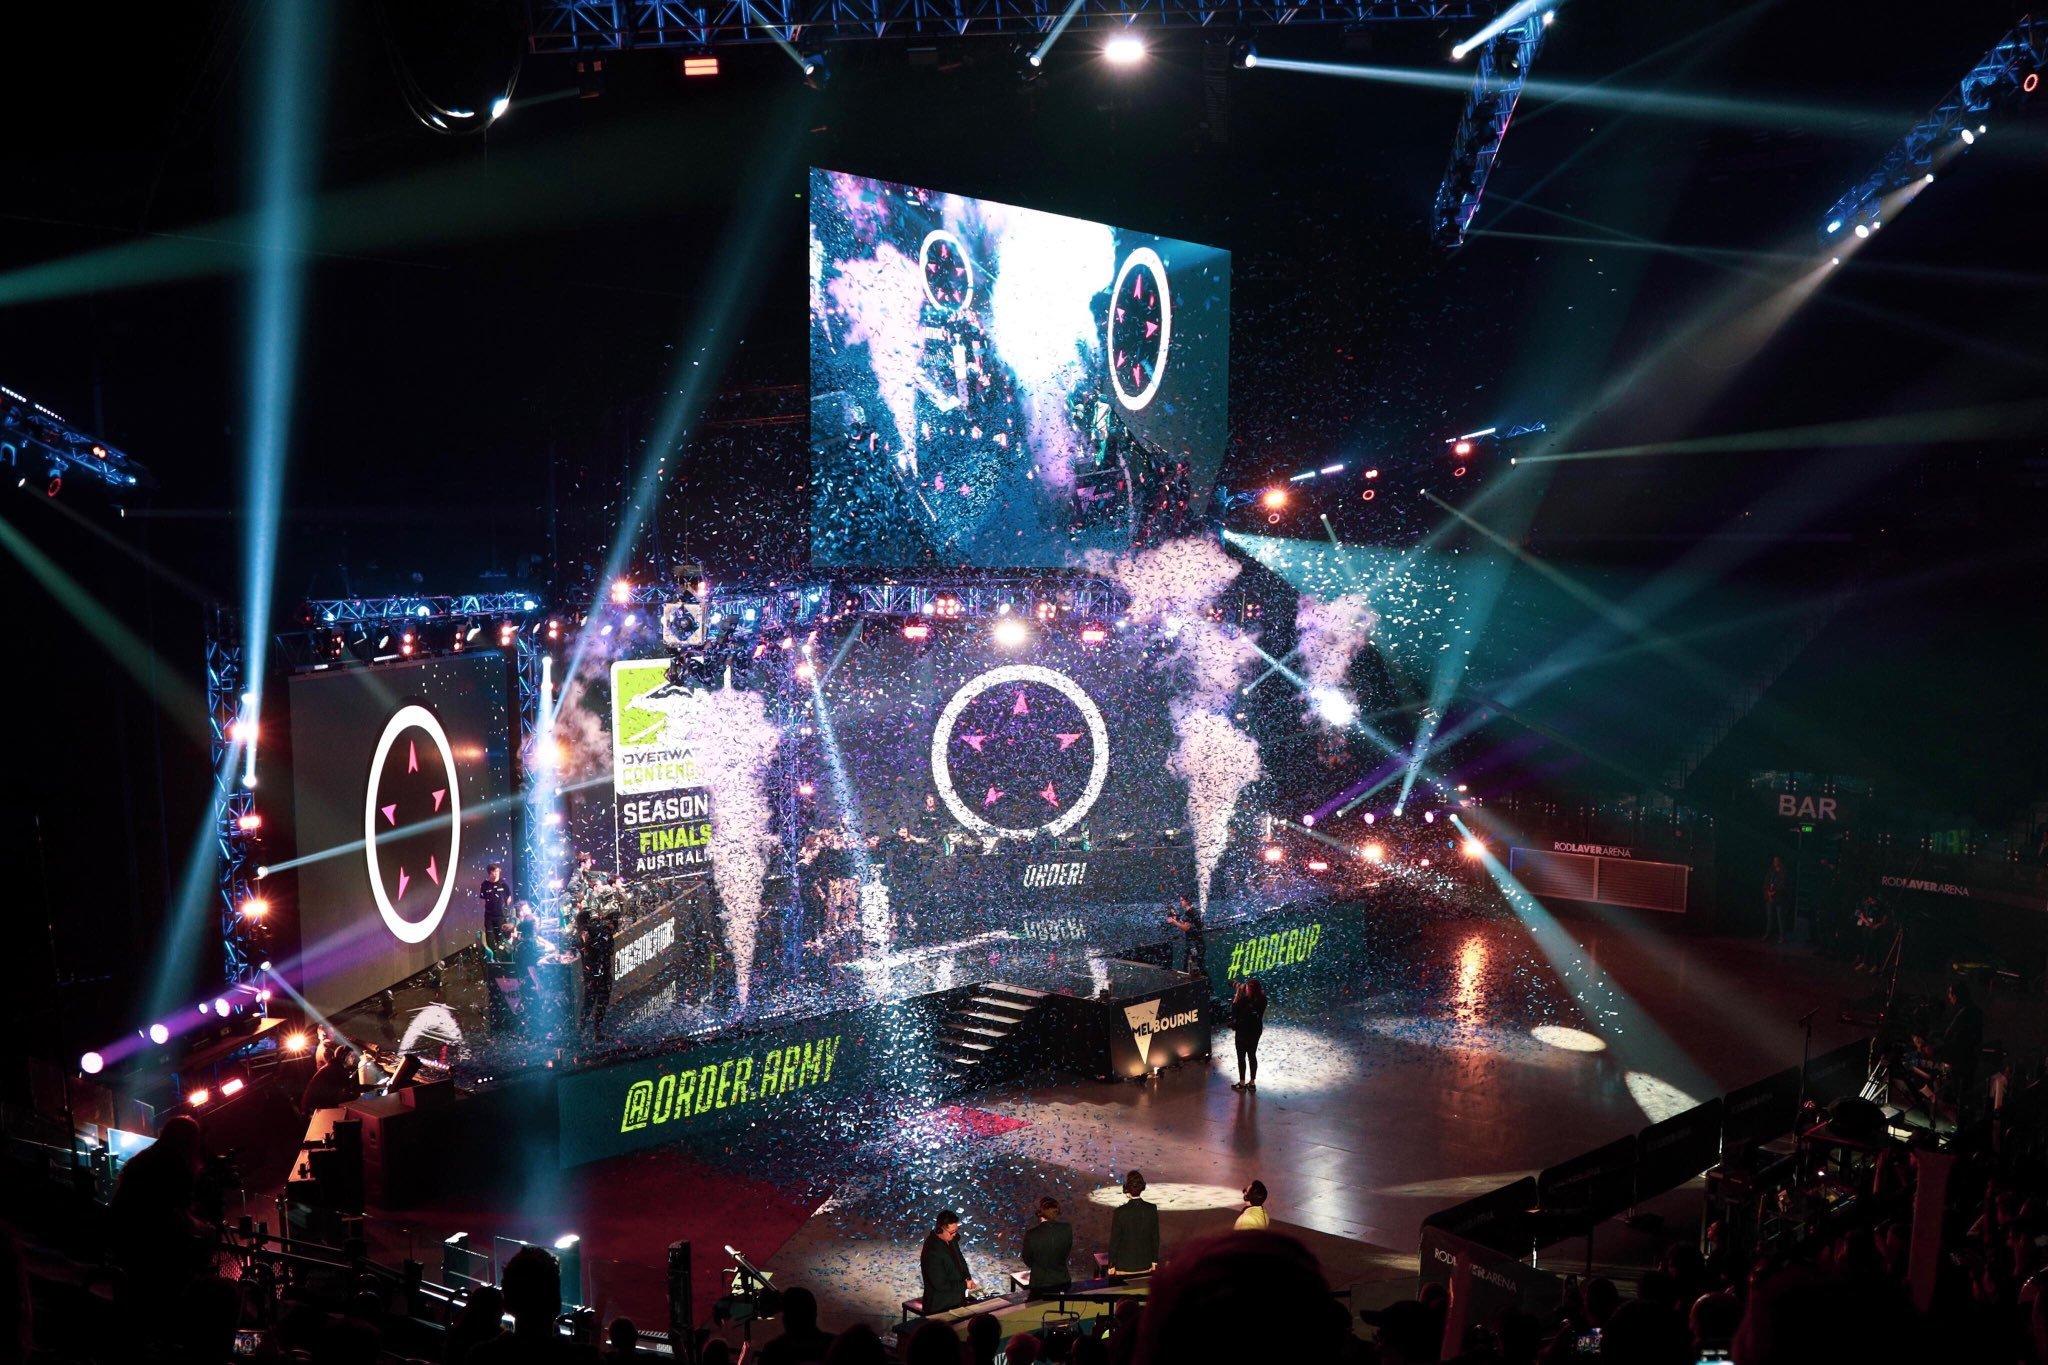 Order crowned champions of Overwatch Contenders Australia 2019 season 2